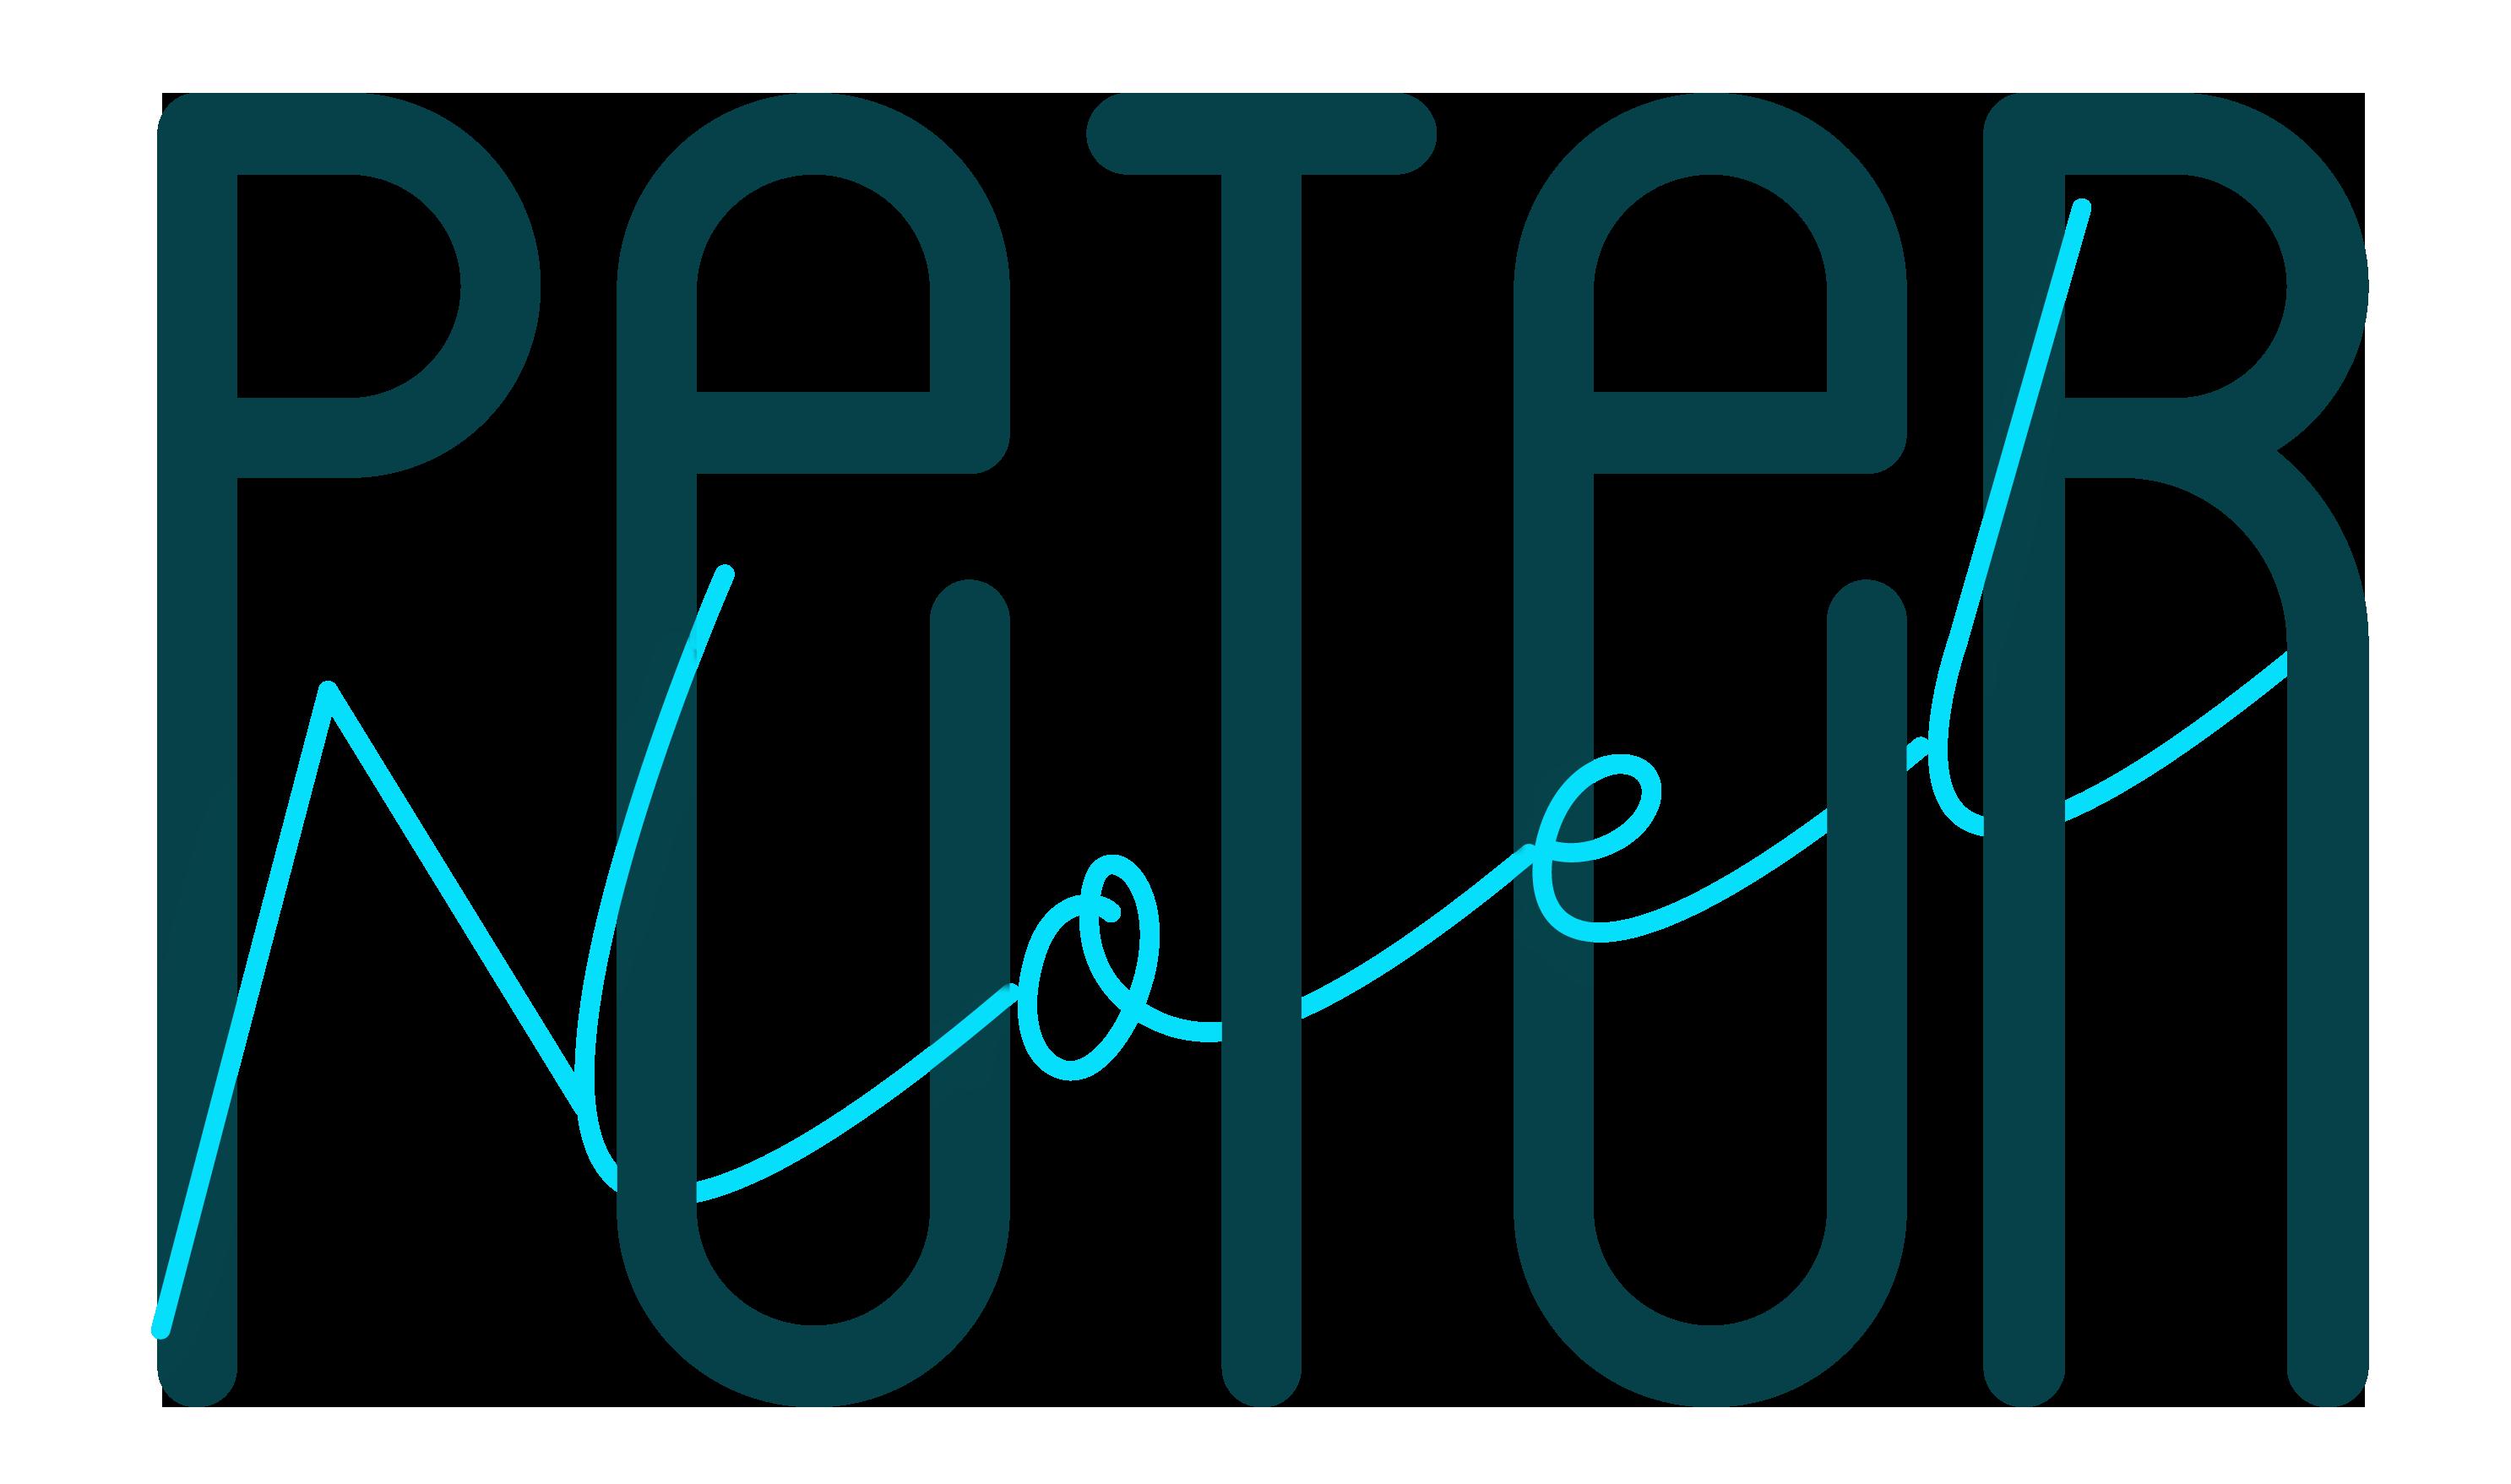 Noel Peter